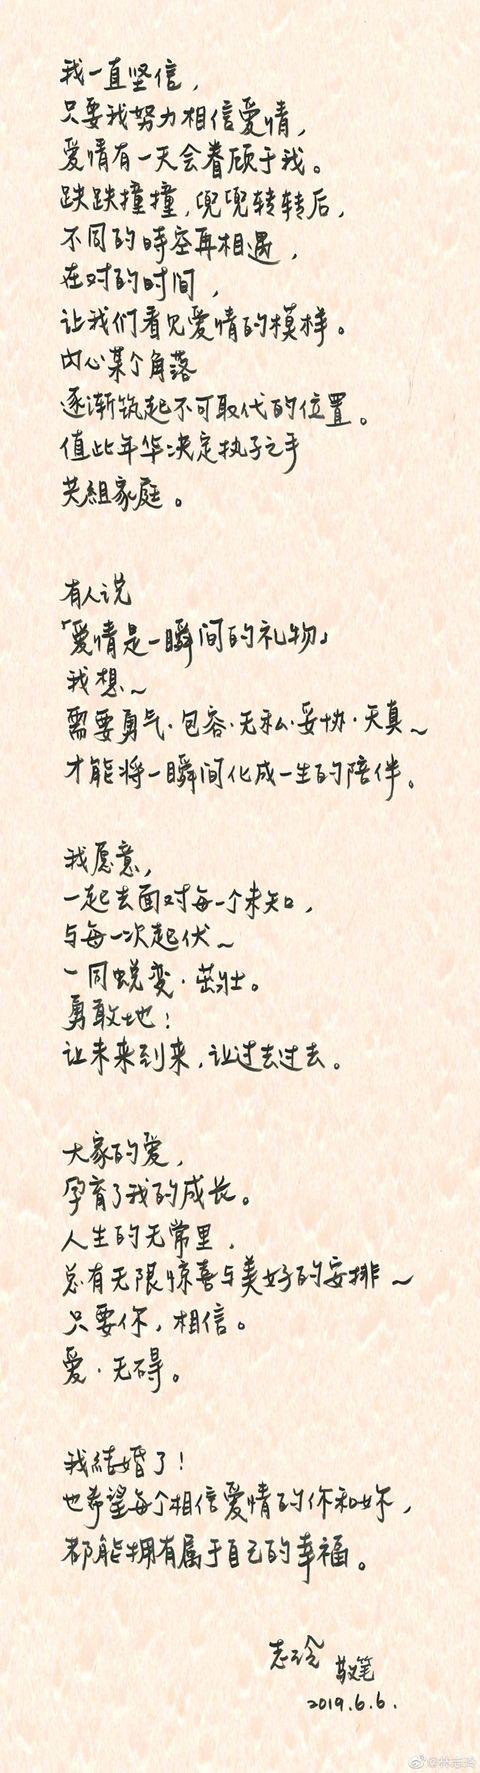 Text, Font, Line, Calligraphy, Art,